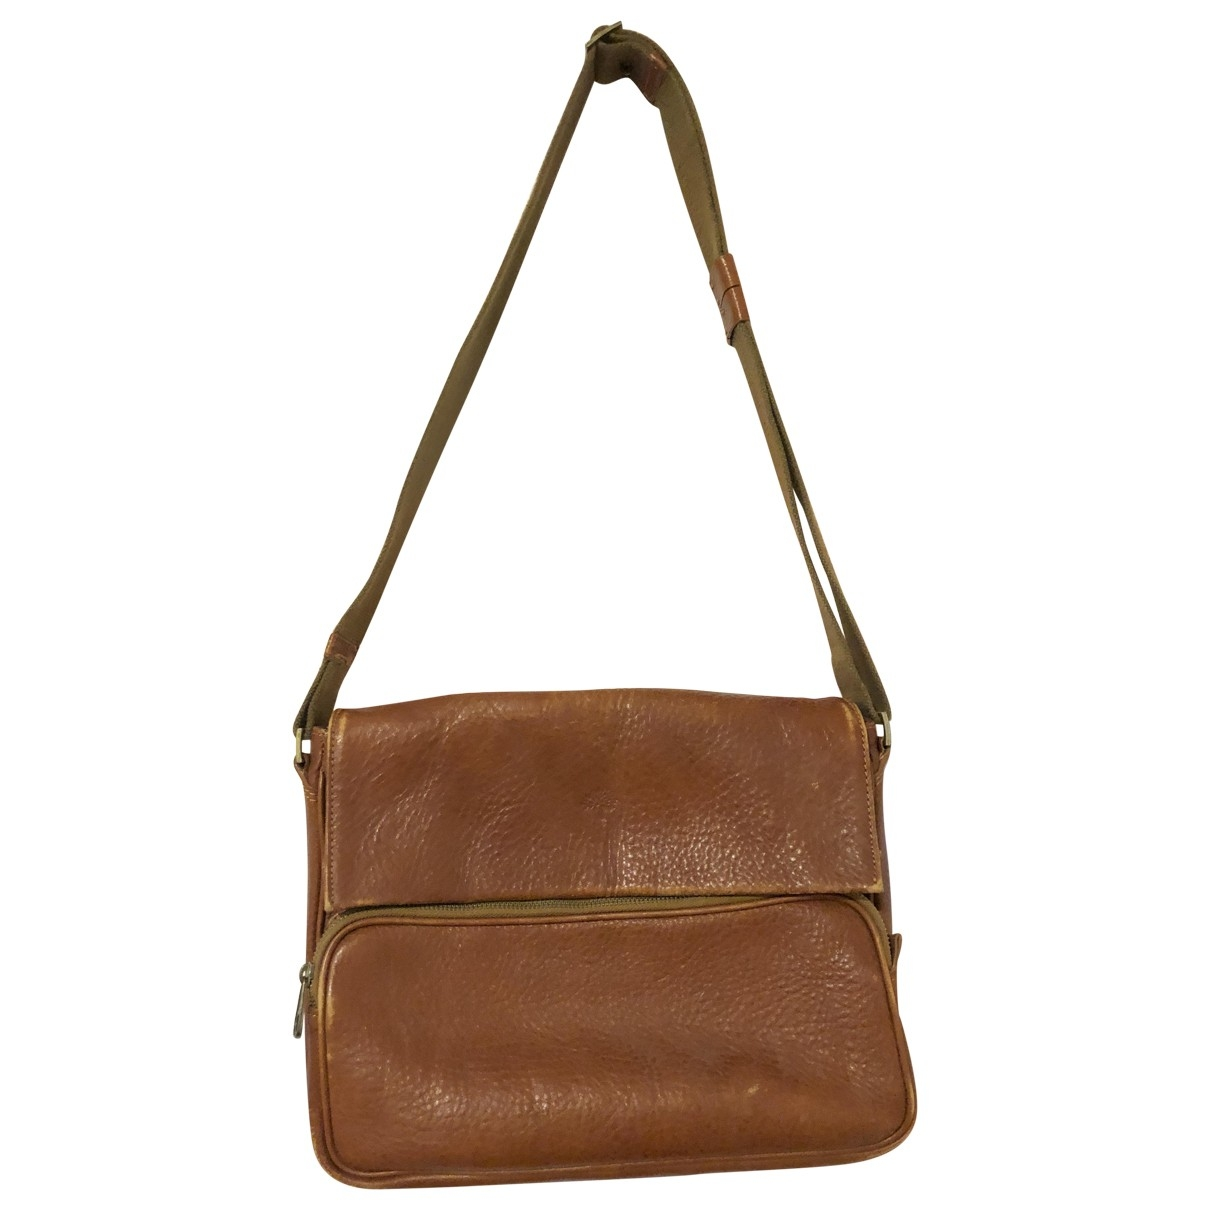 Mulberry \N Brown Leather handbag for Women \N